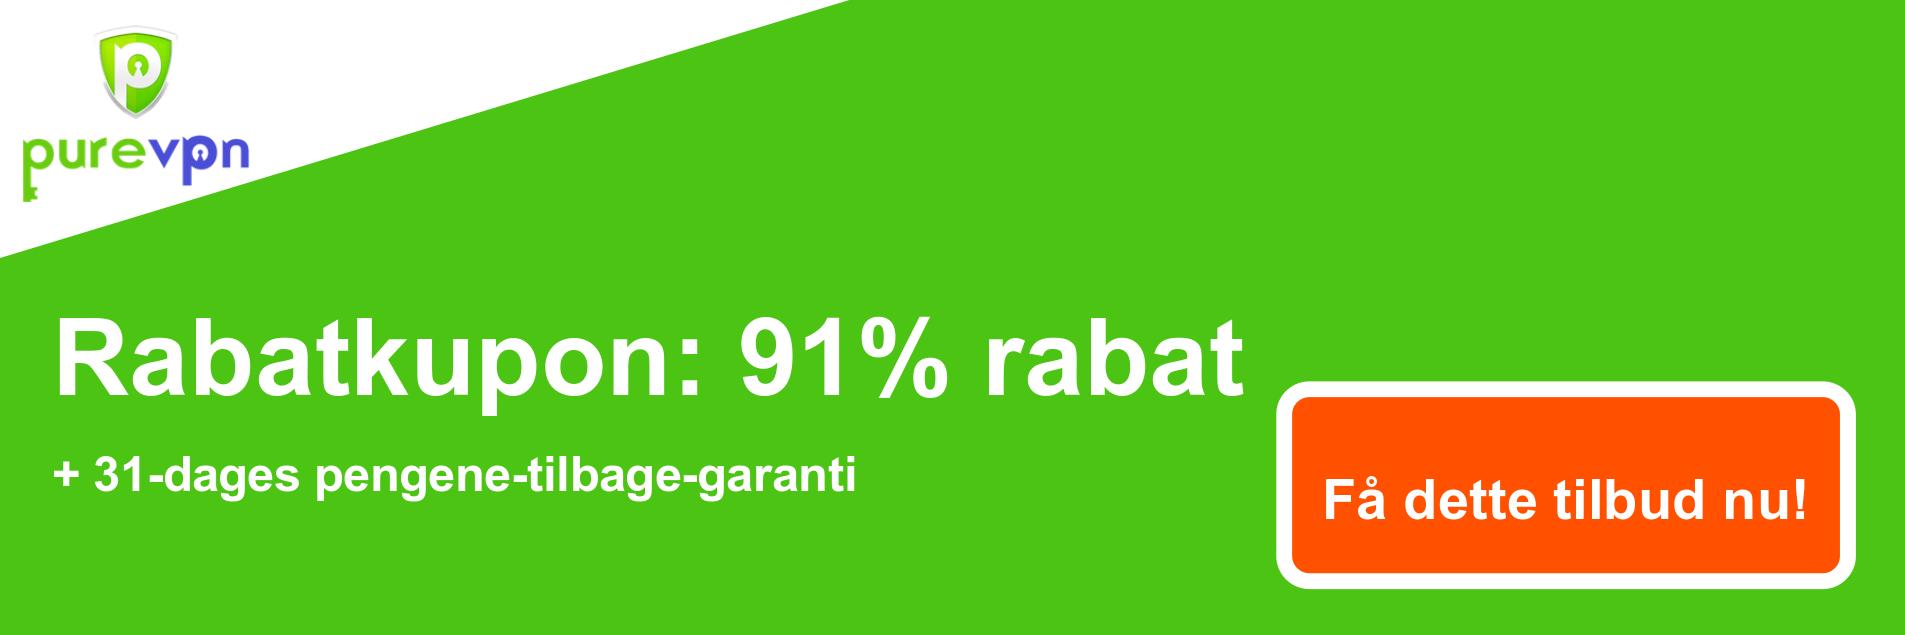 PureVPN-kuponbanner - 91% rabat